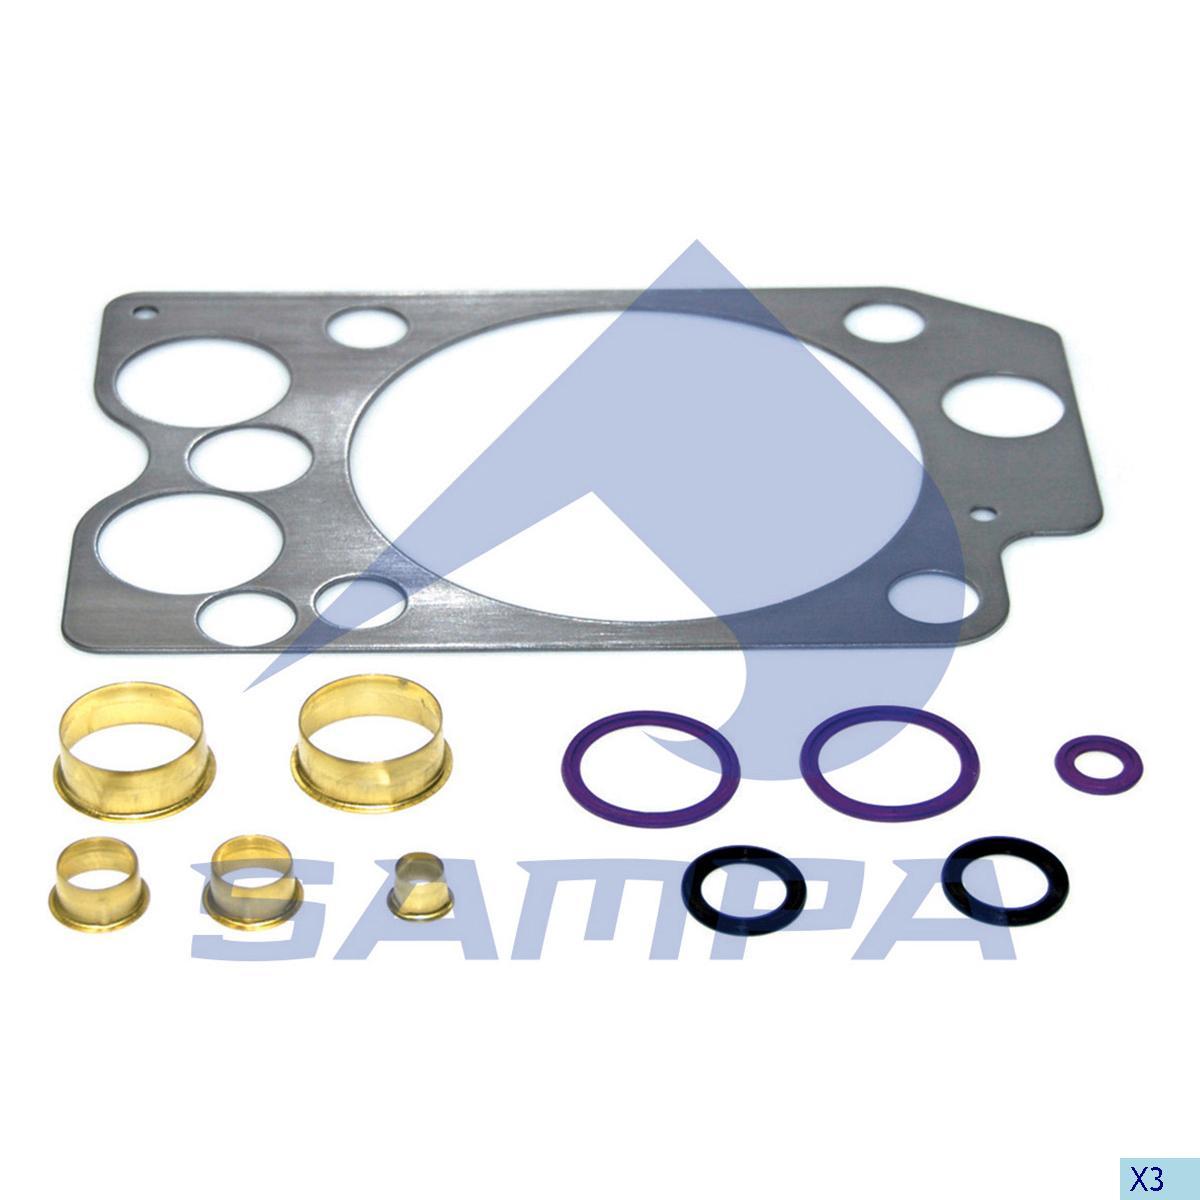 Gasket Kit, Cylinder Head, Volvo, Engine